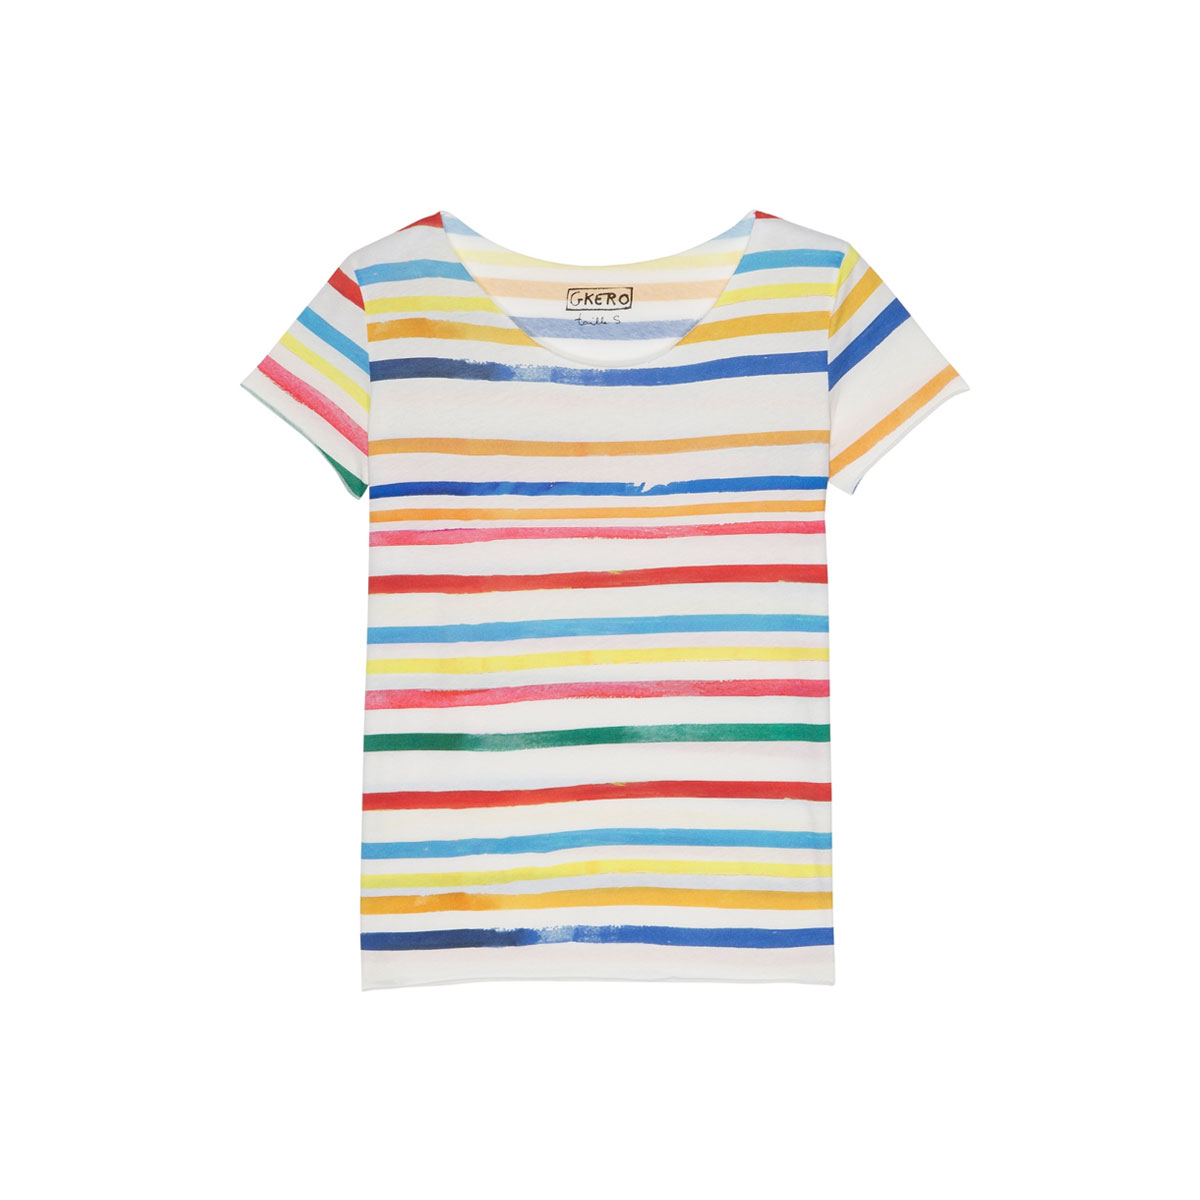 G.KERO Tee shirt SUMMER